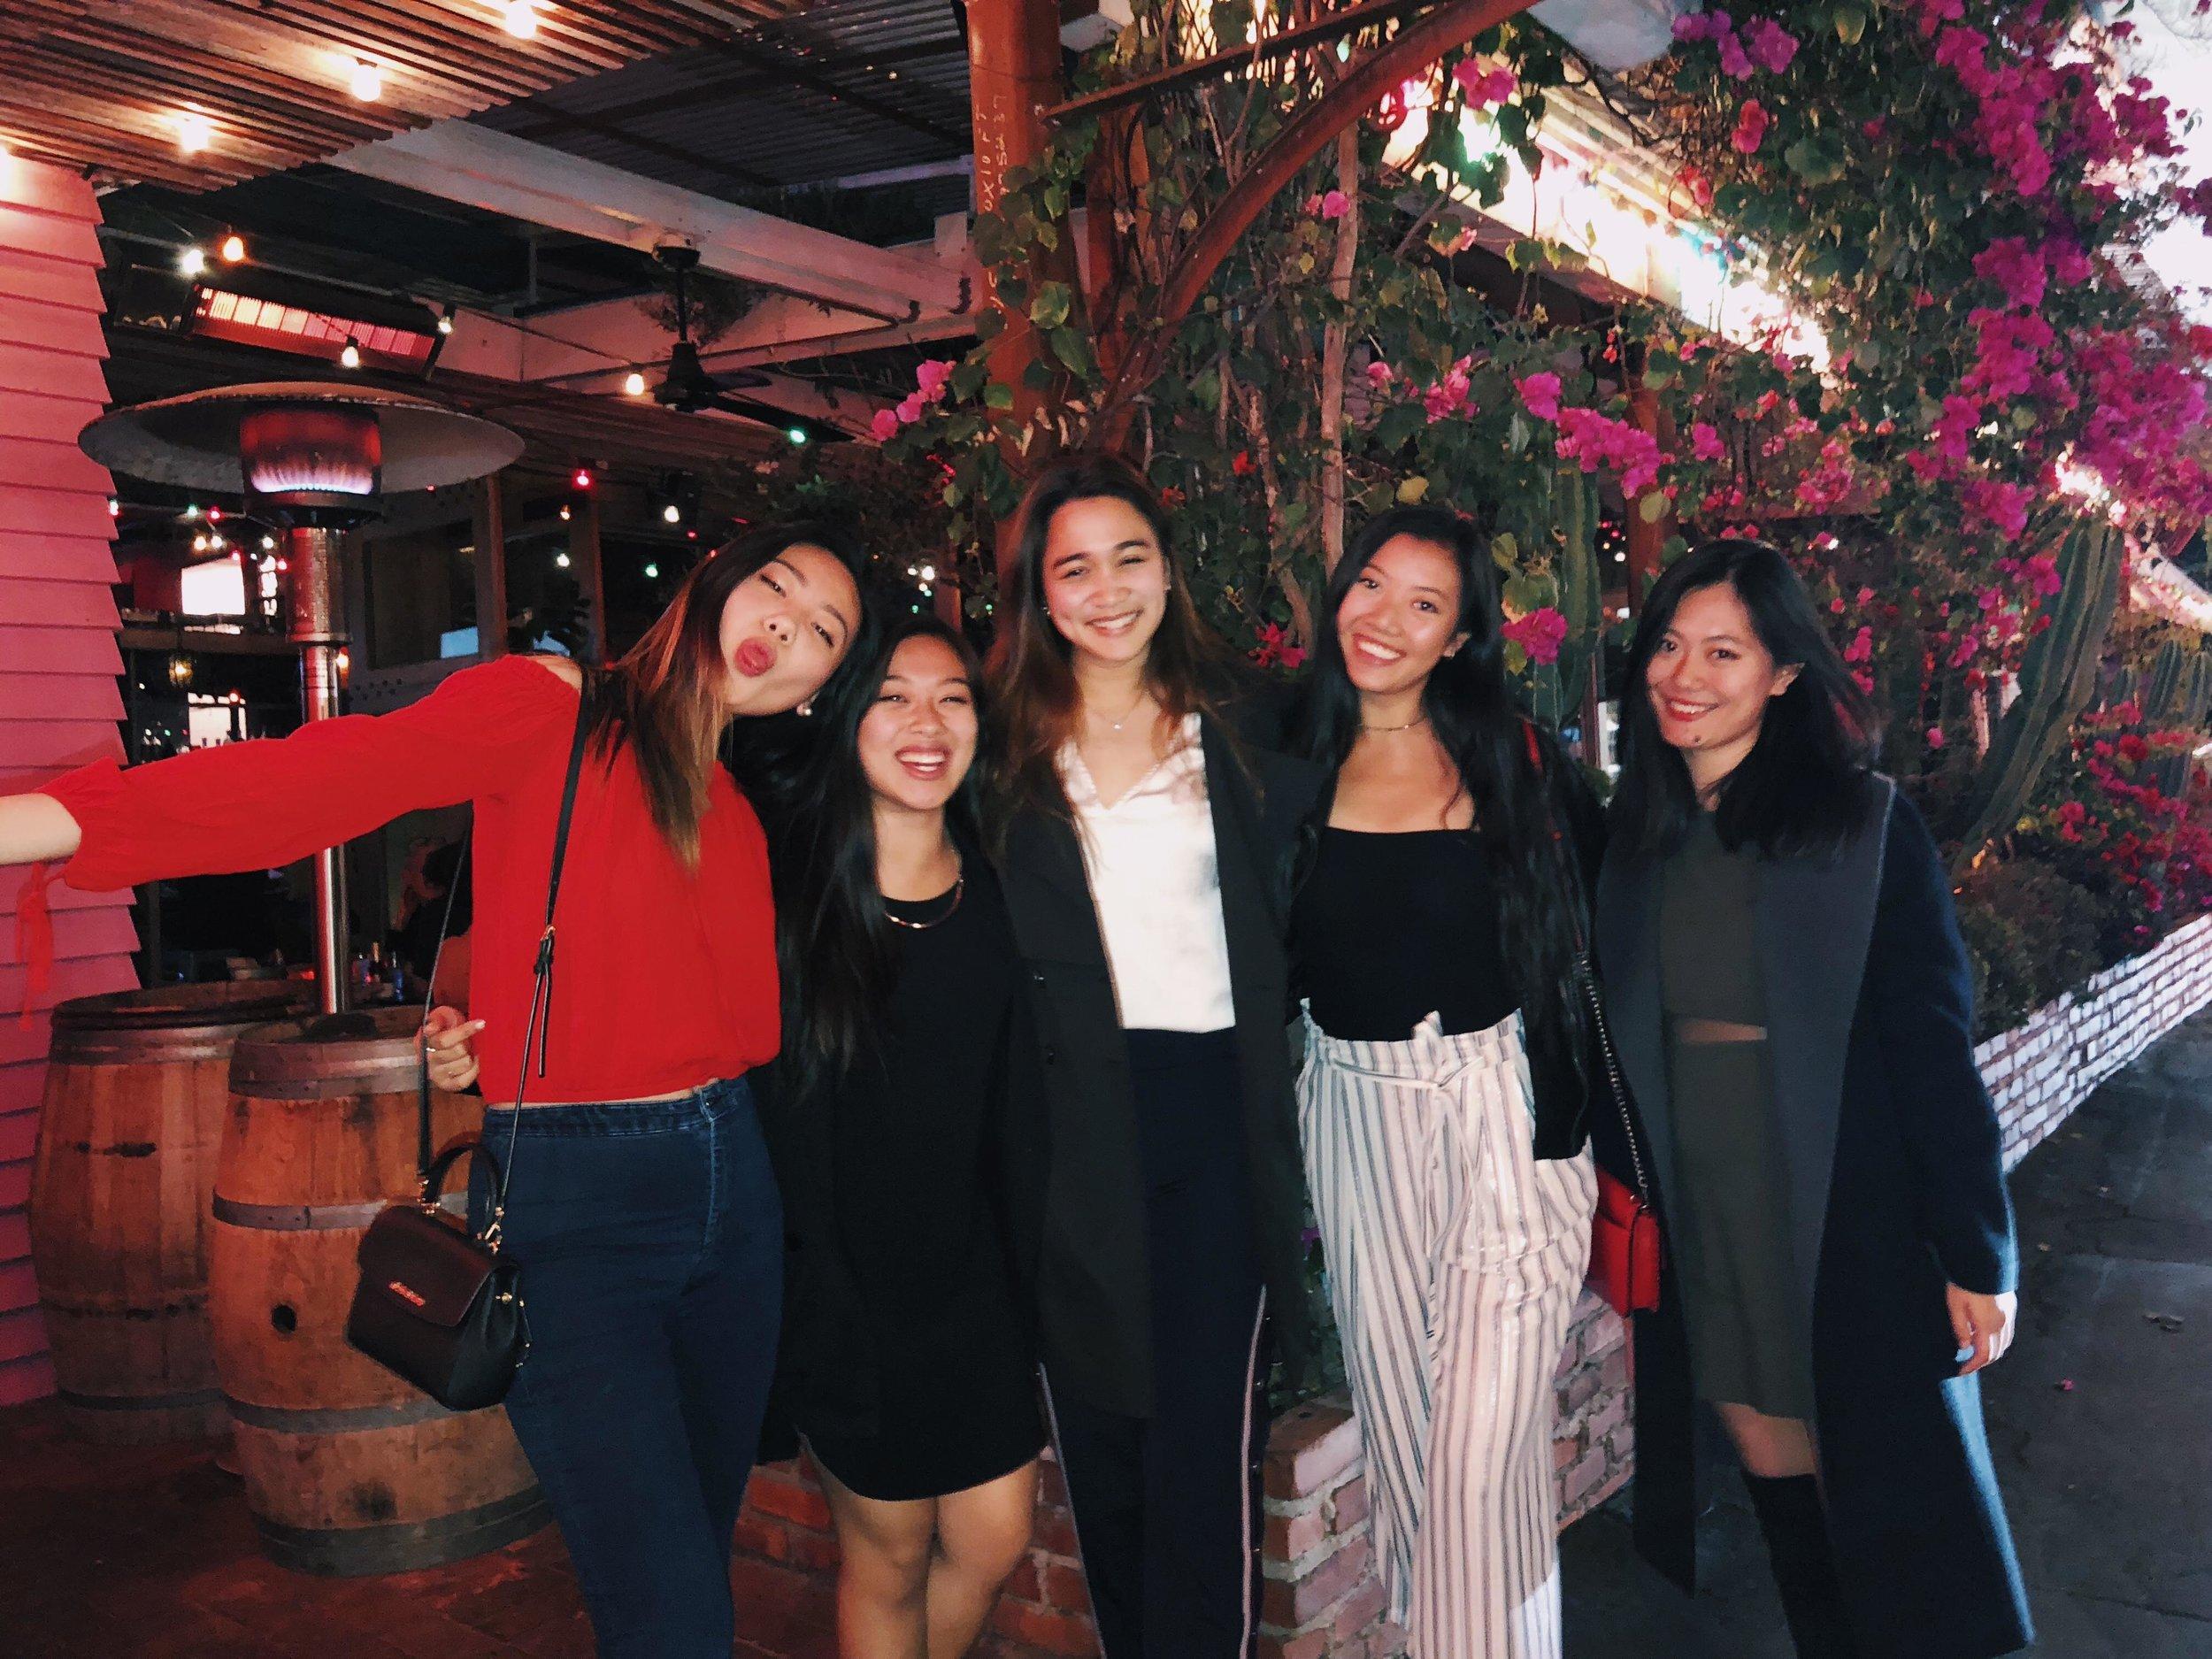 Senior Send-Off Banquet 2017